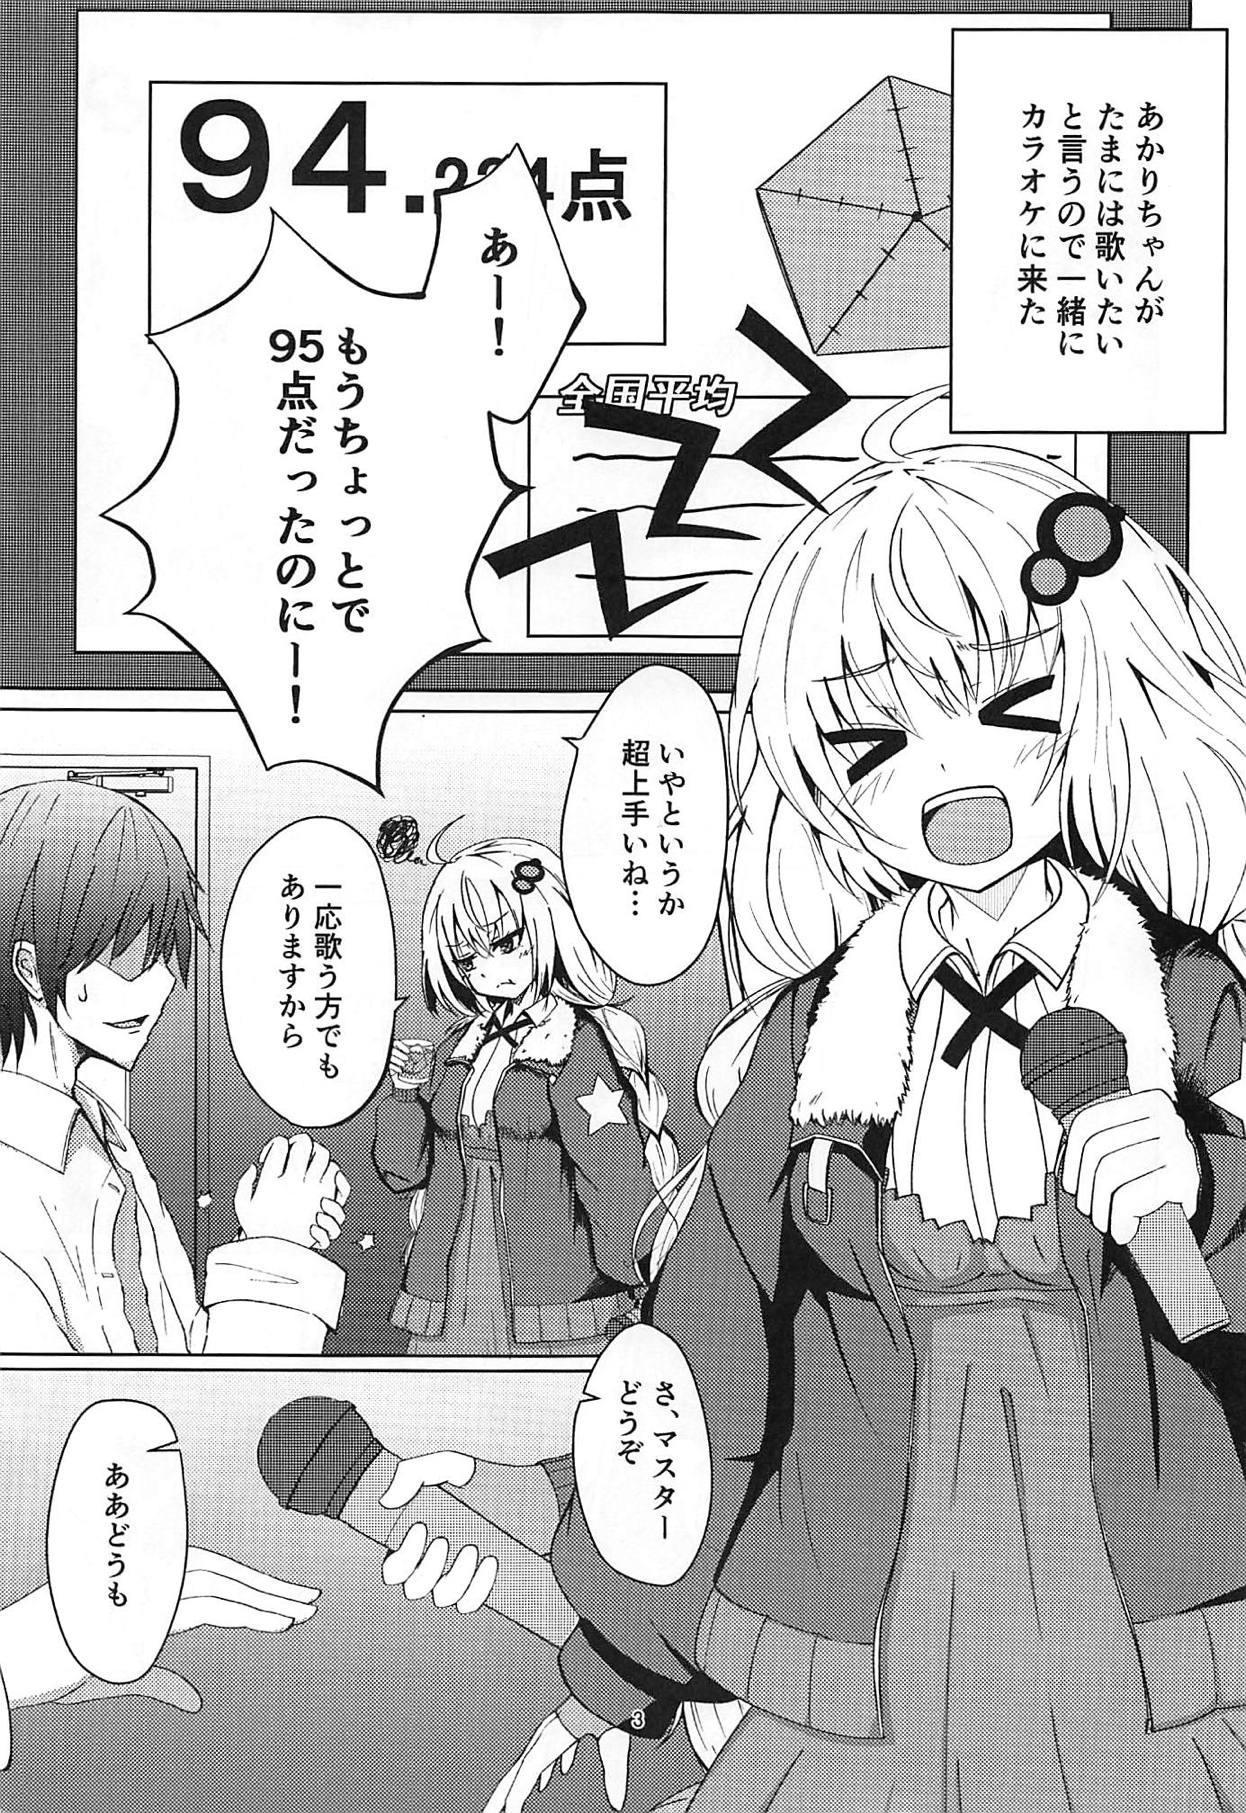 Akari-chan to Karaoke Ecchi 1